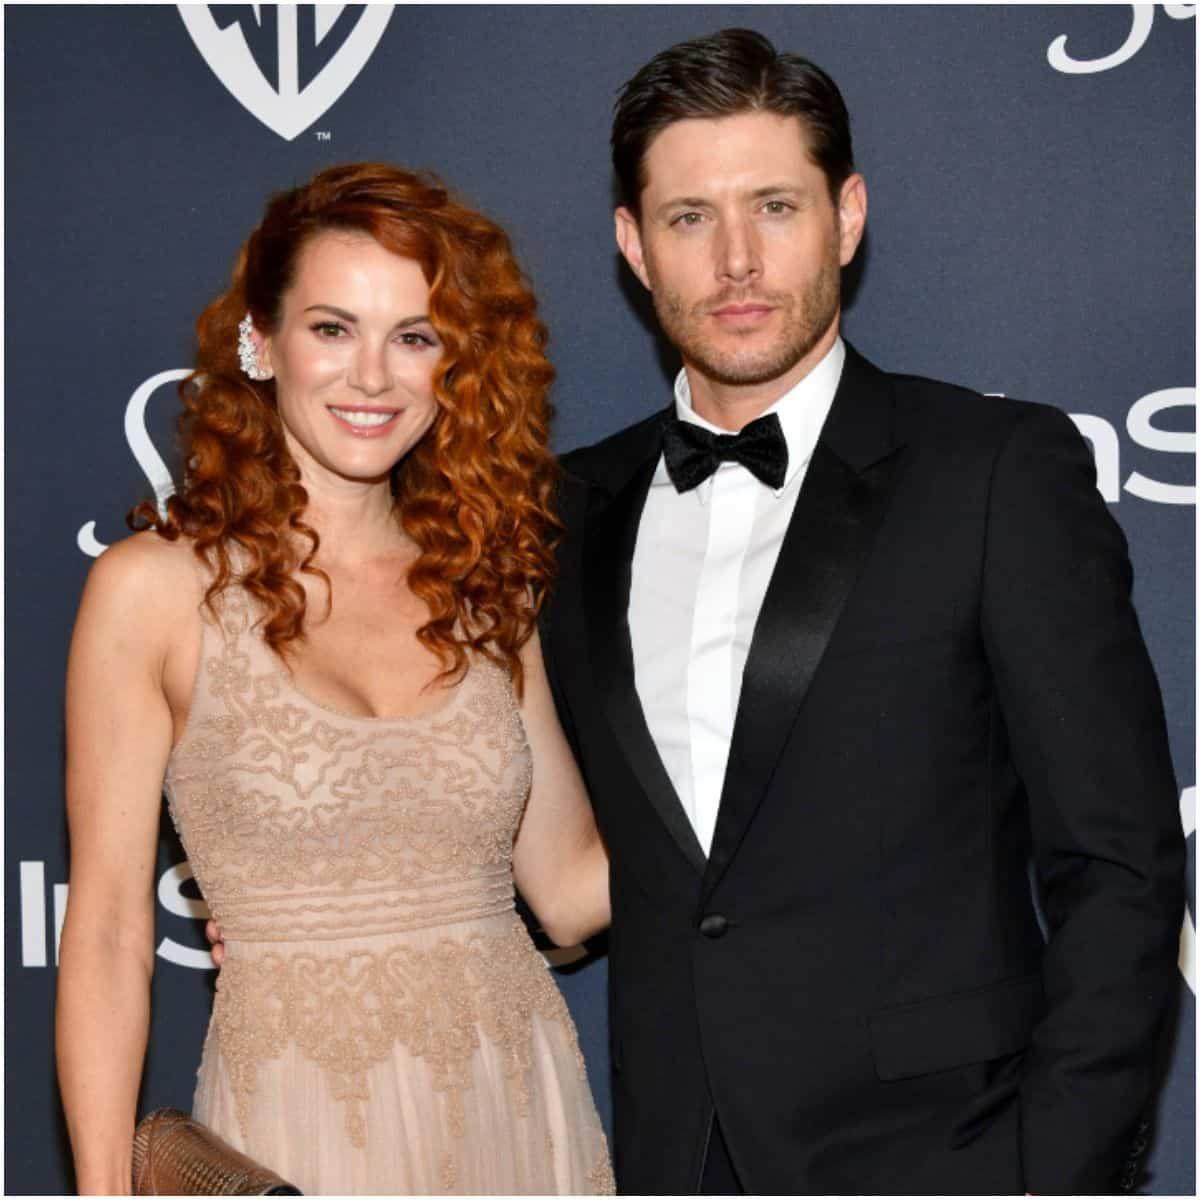 Jensen Ackles and wife Danneel Ackles